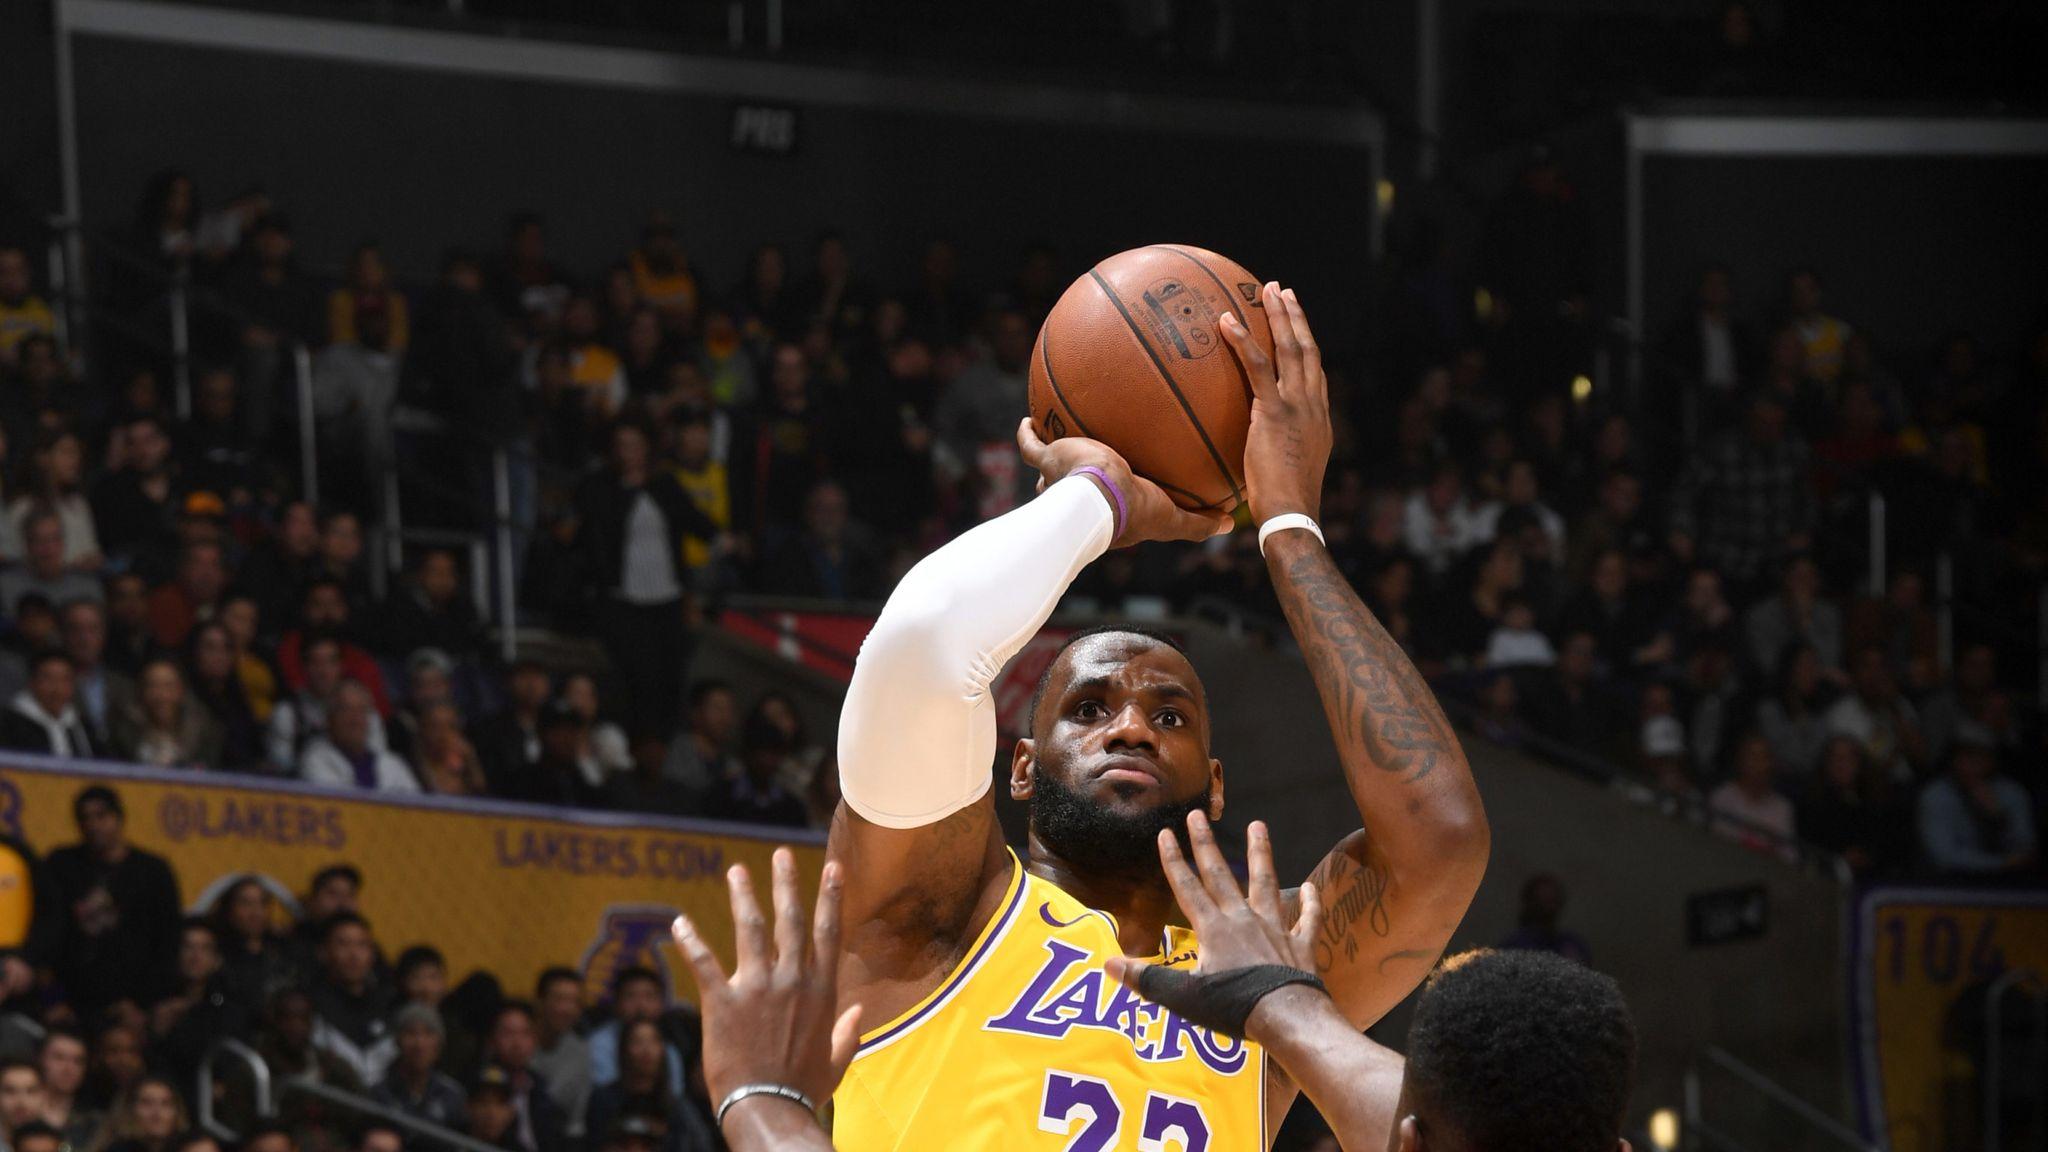 size 40 83d2a 842e3 LeBron James scores 29 points as Los Angeles Lakers record ...